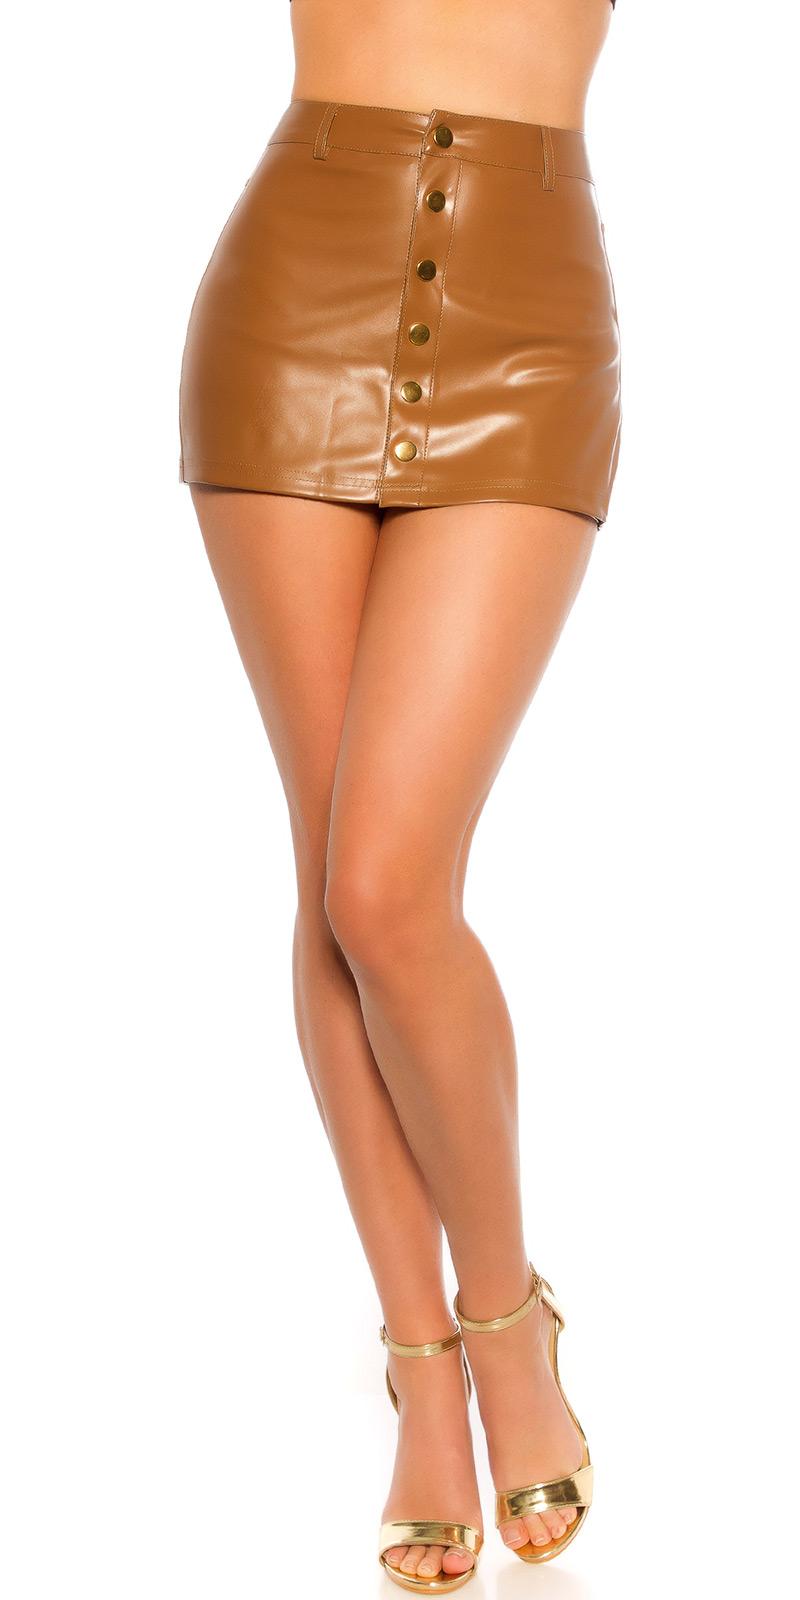 Fusta pantaloni sexy Mini piele ecologica